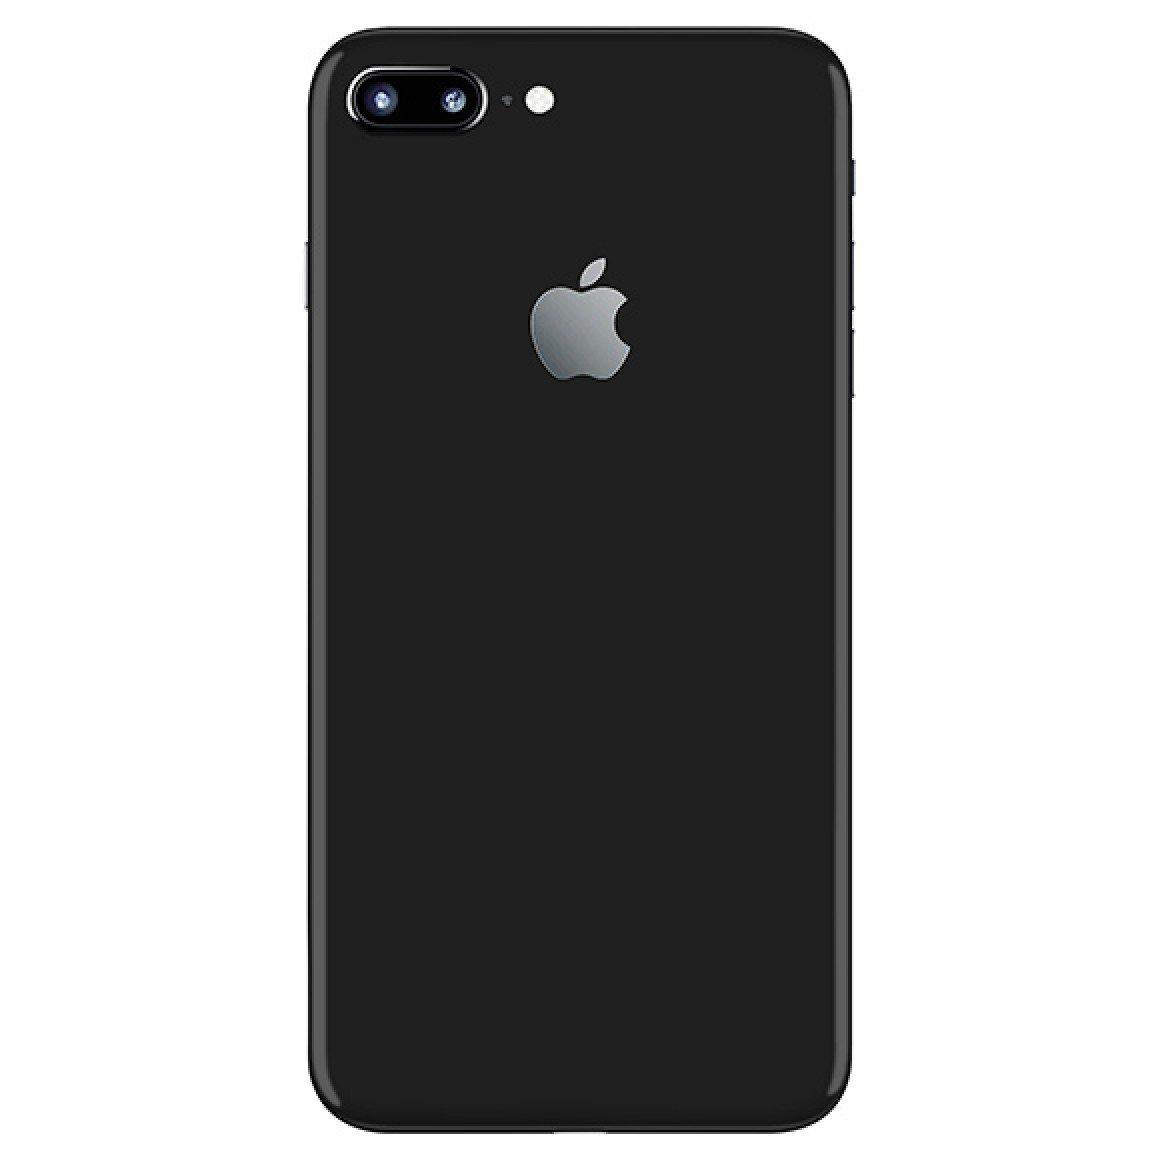 StickOn iPhone 7 Plus Vinyl Matte Series Mobile Skin Amazon